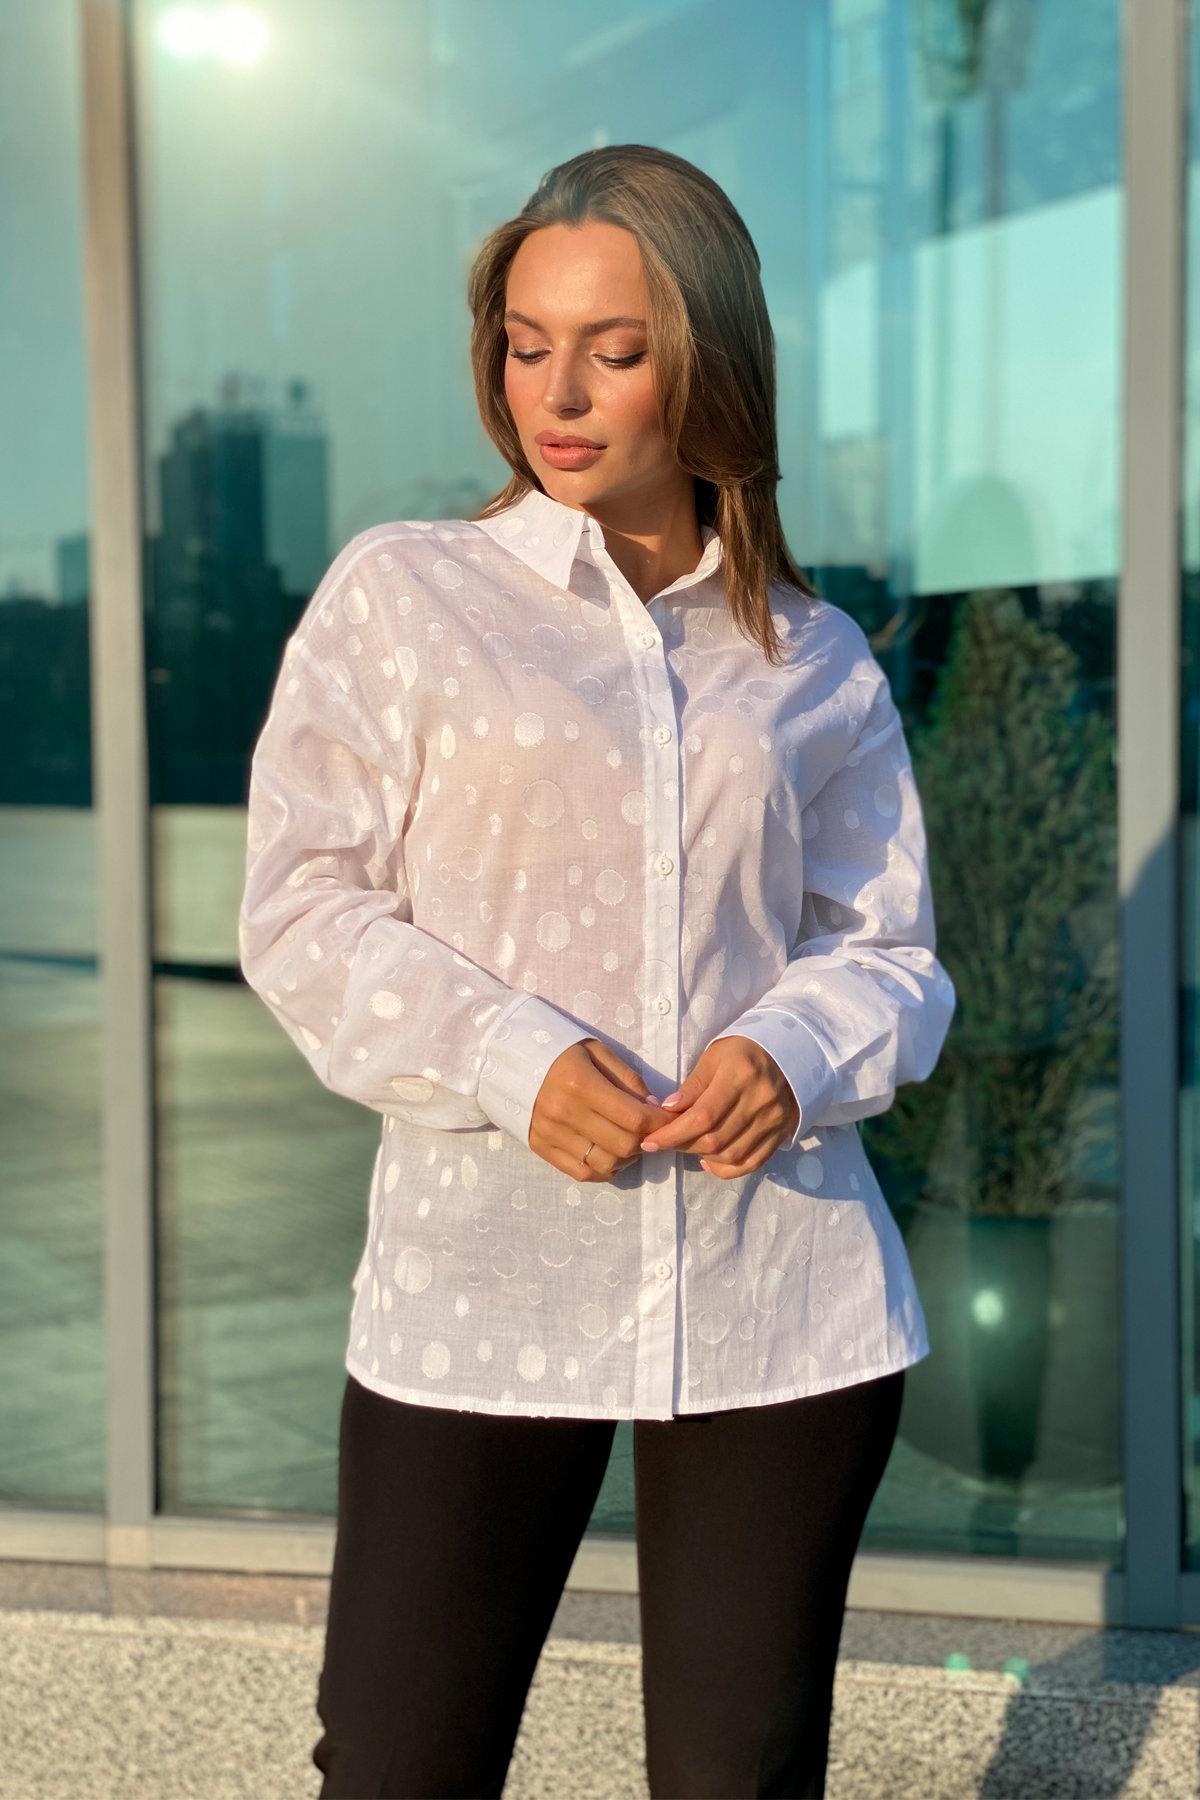 Блуза Эйплс 96242 АРТ. 45930 Цвет: Белый - фото 8, интернет магазин tm-modus.ru